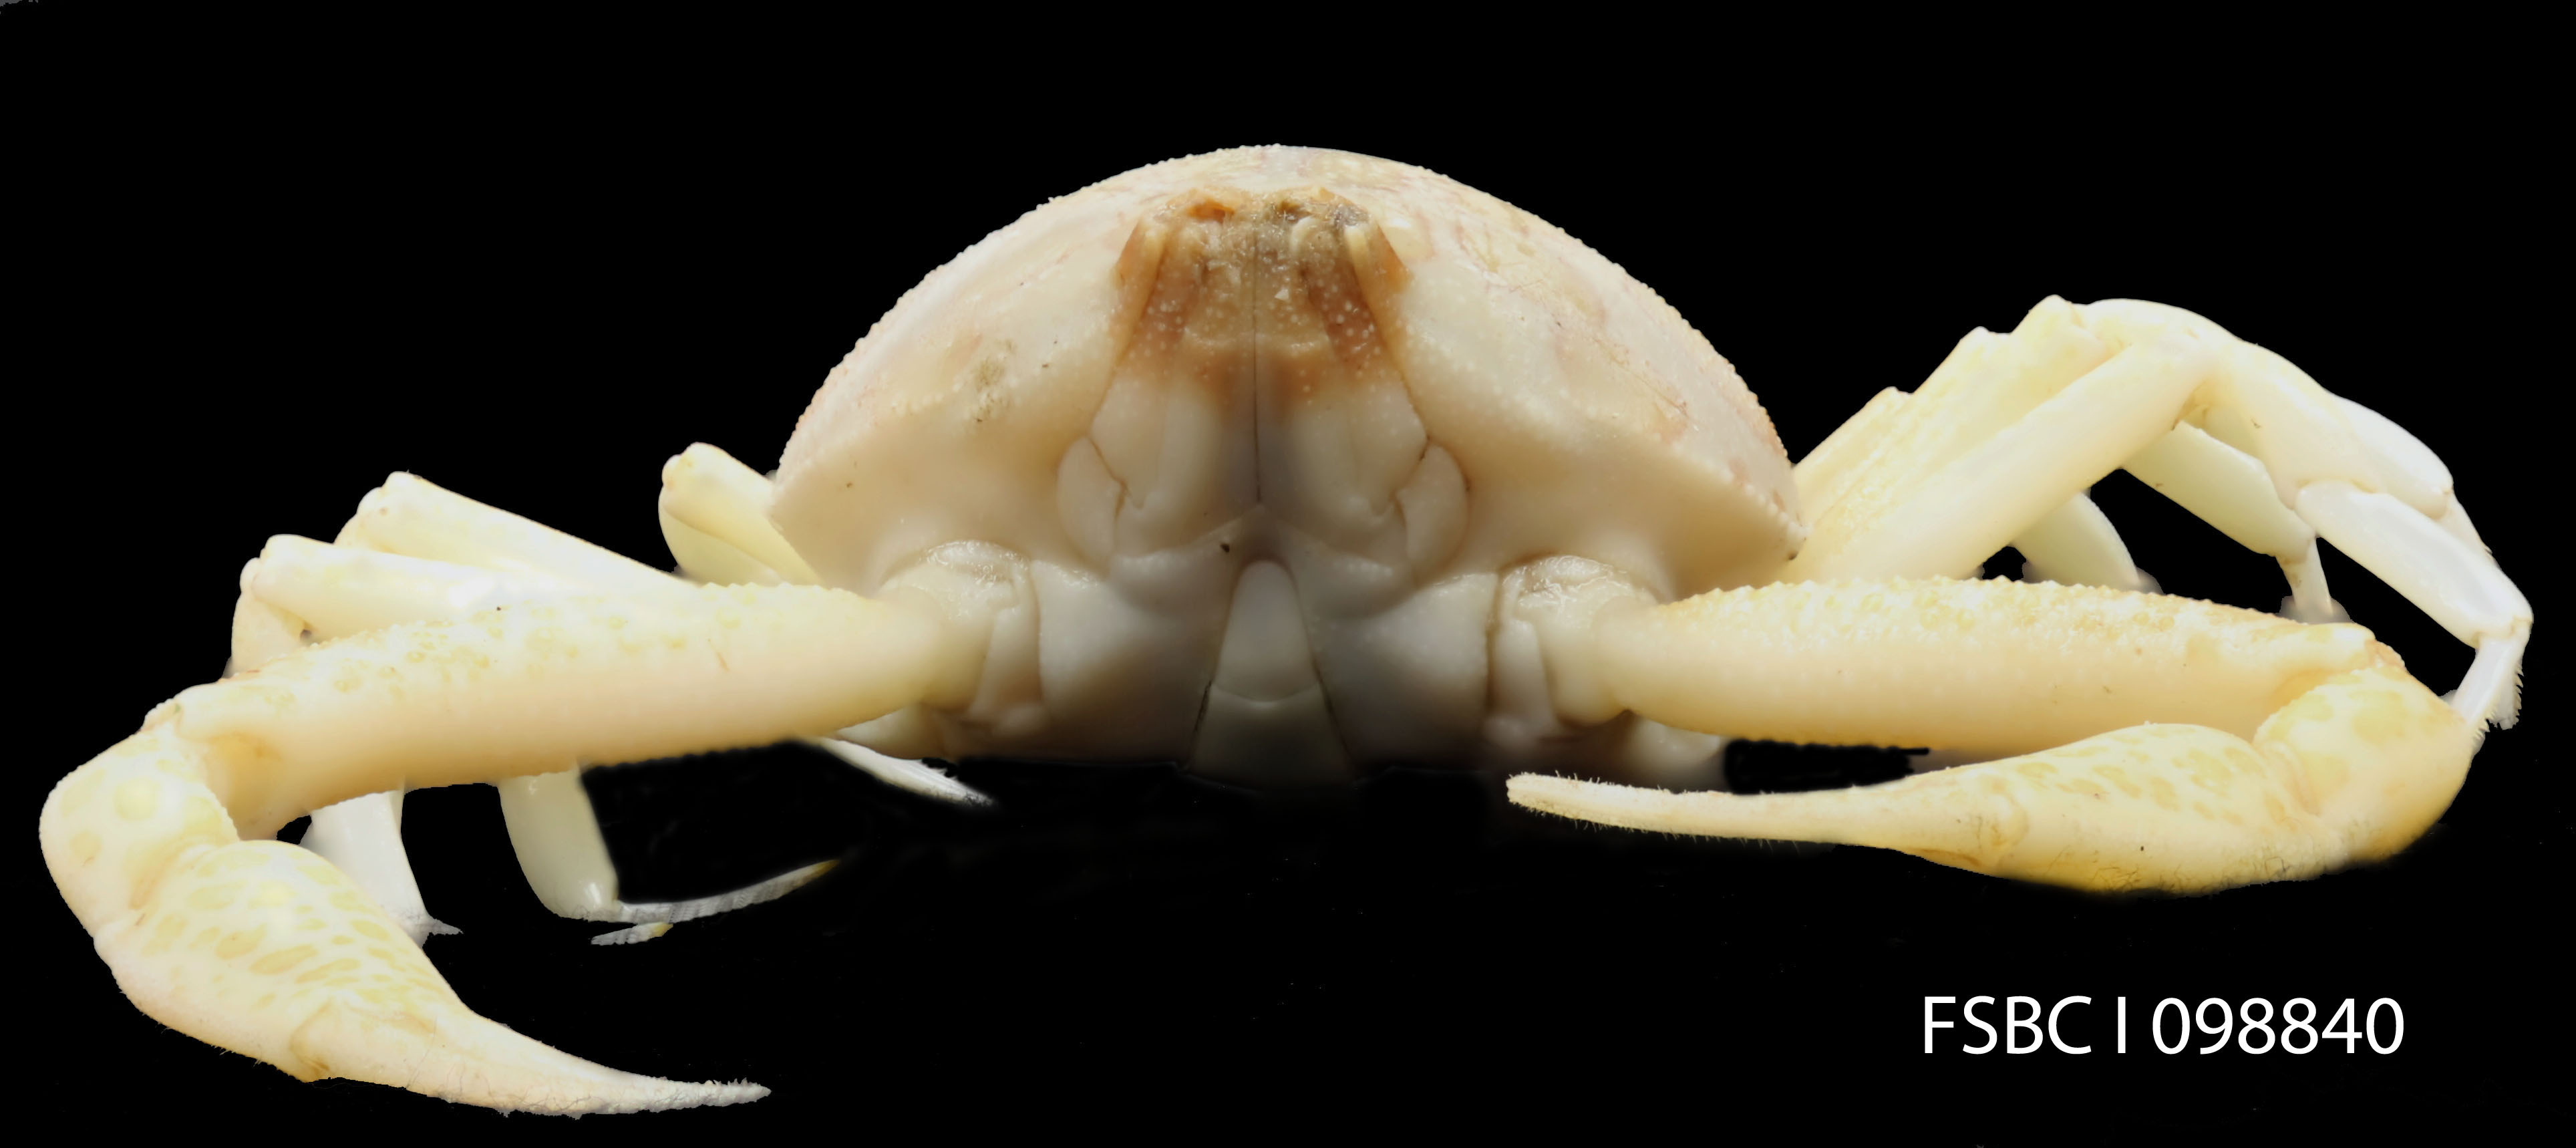 Image of Mottled Purse Crab